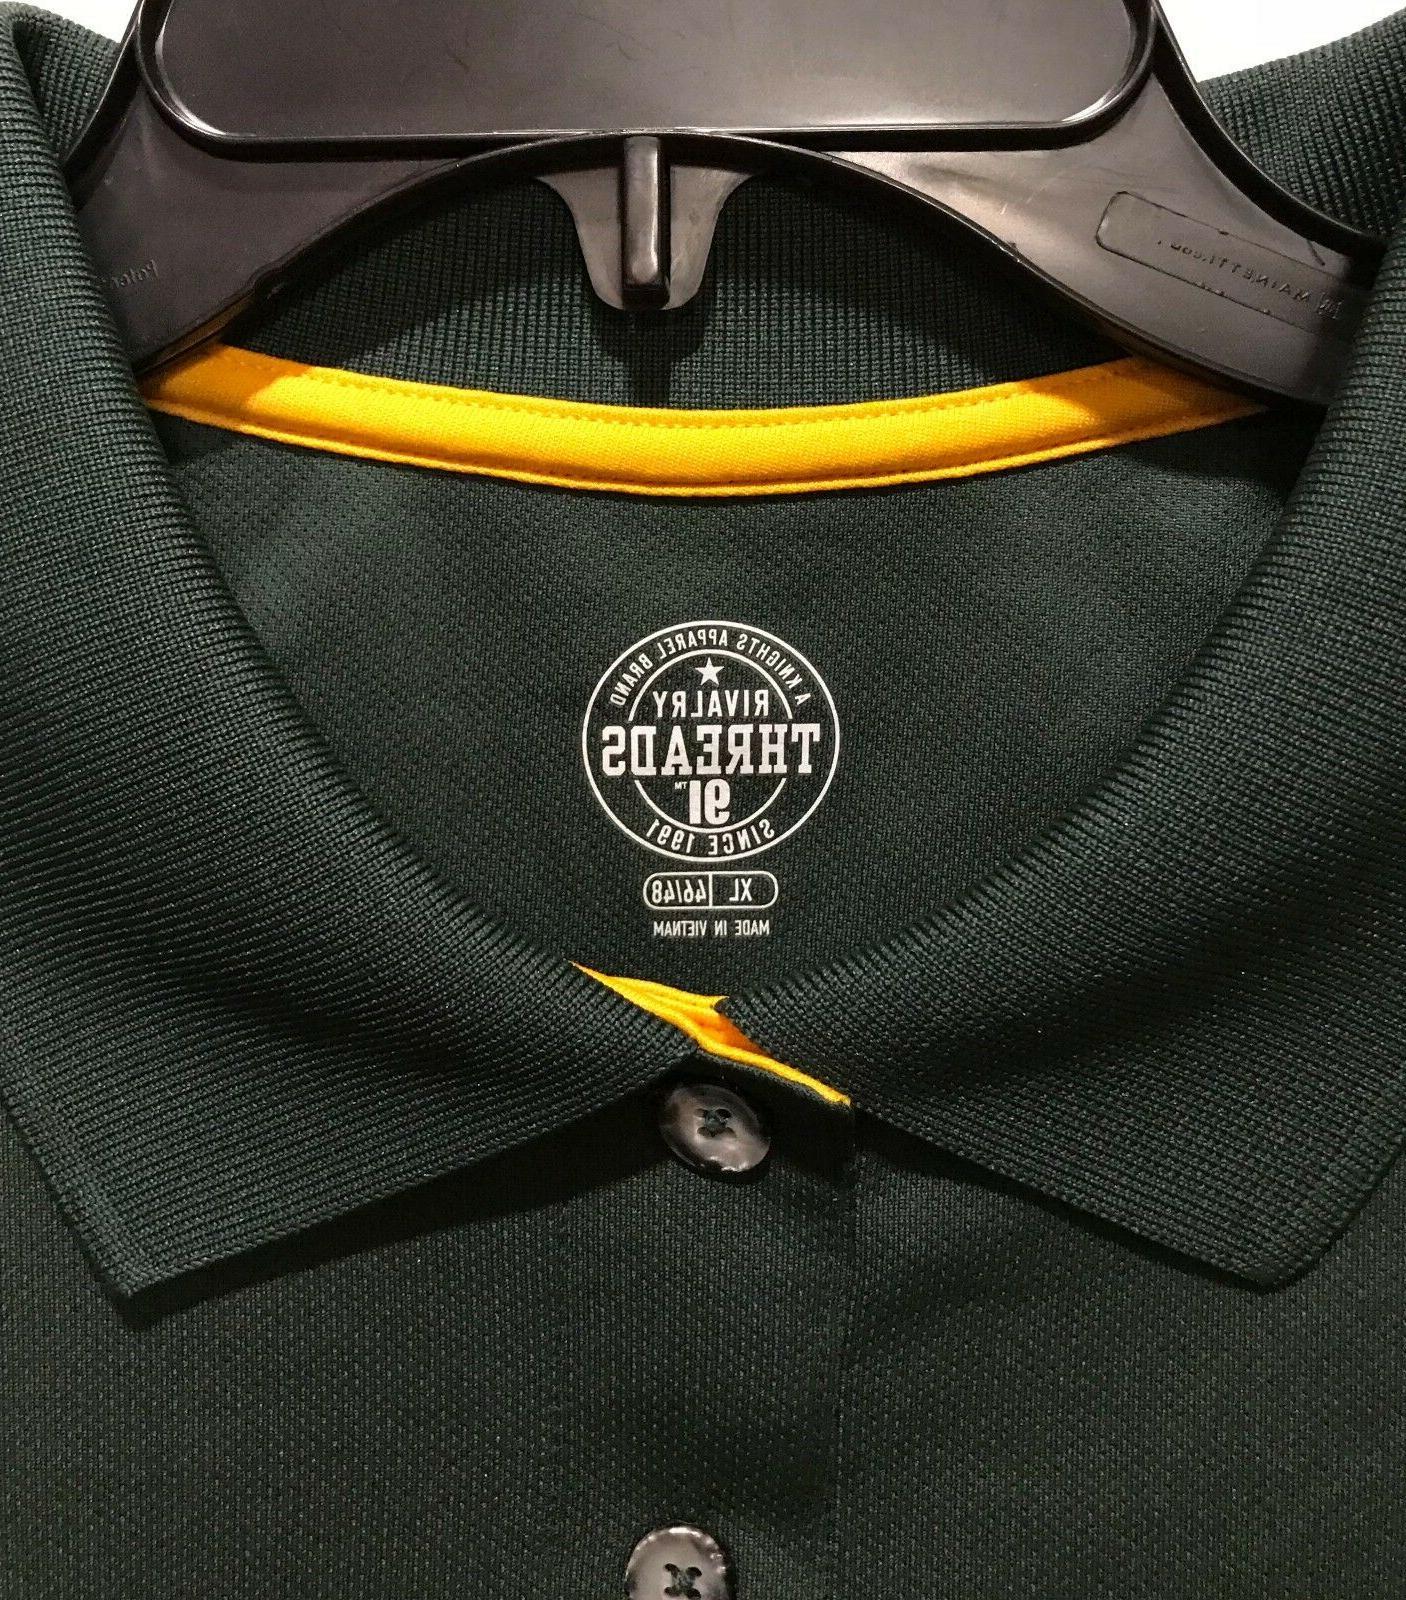 New $30 BAYLOR University Bears Shirt Embroidered Logo